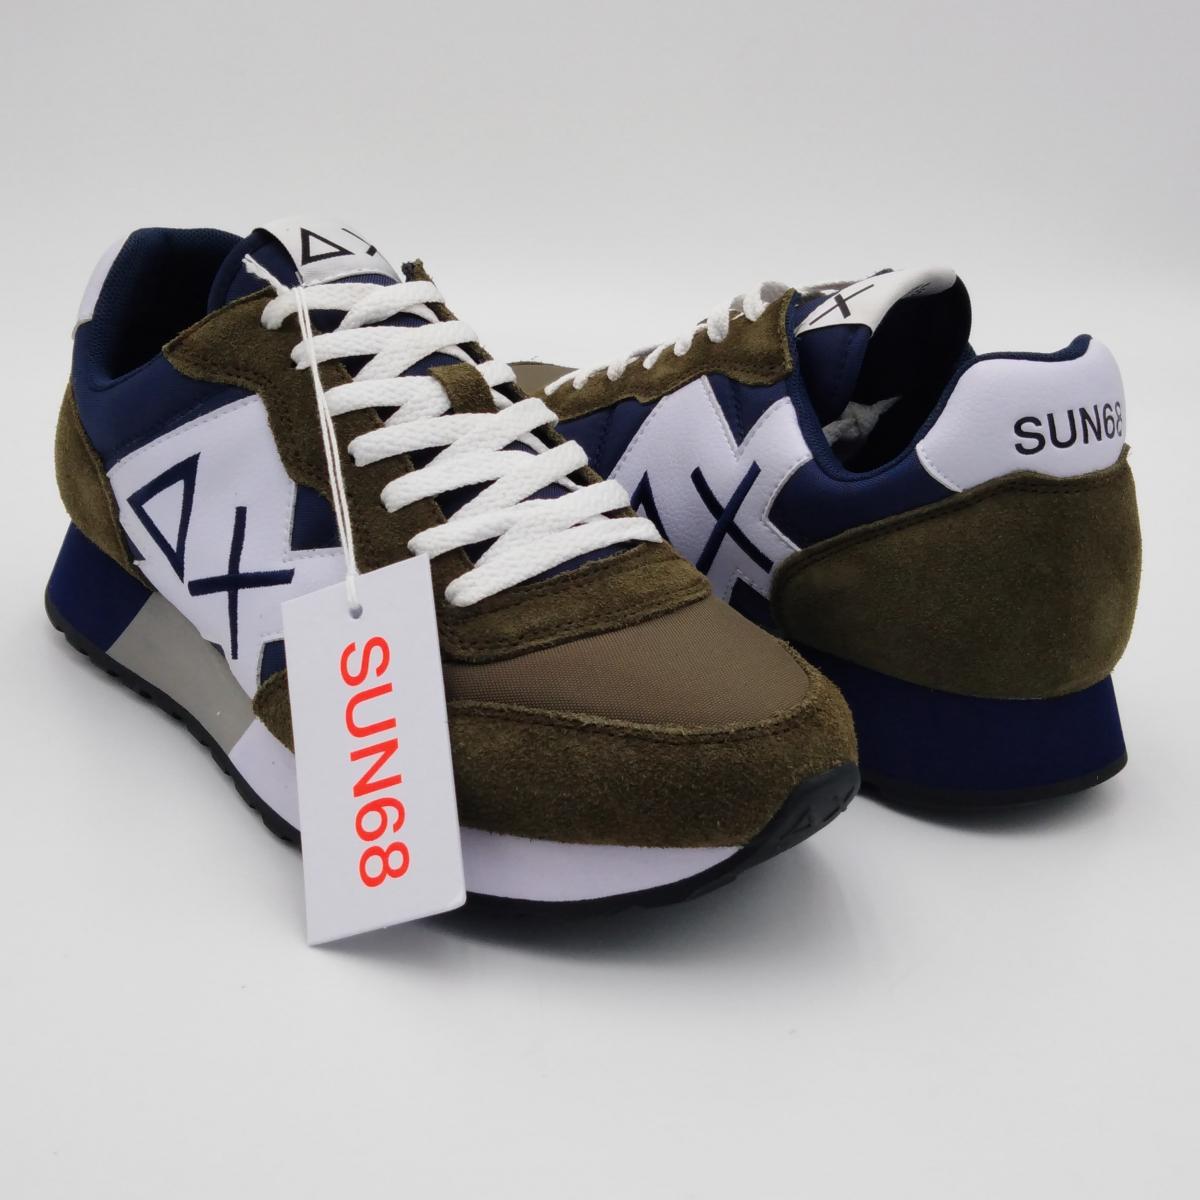 Sun 68 -Sneaker Uomo Jaki...